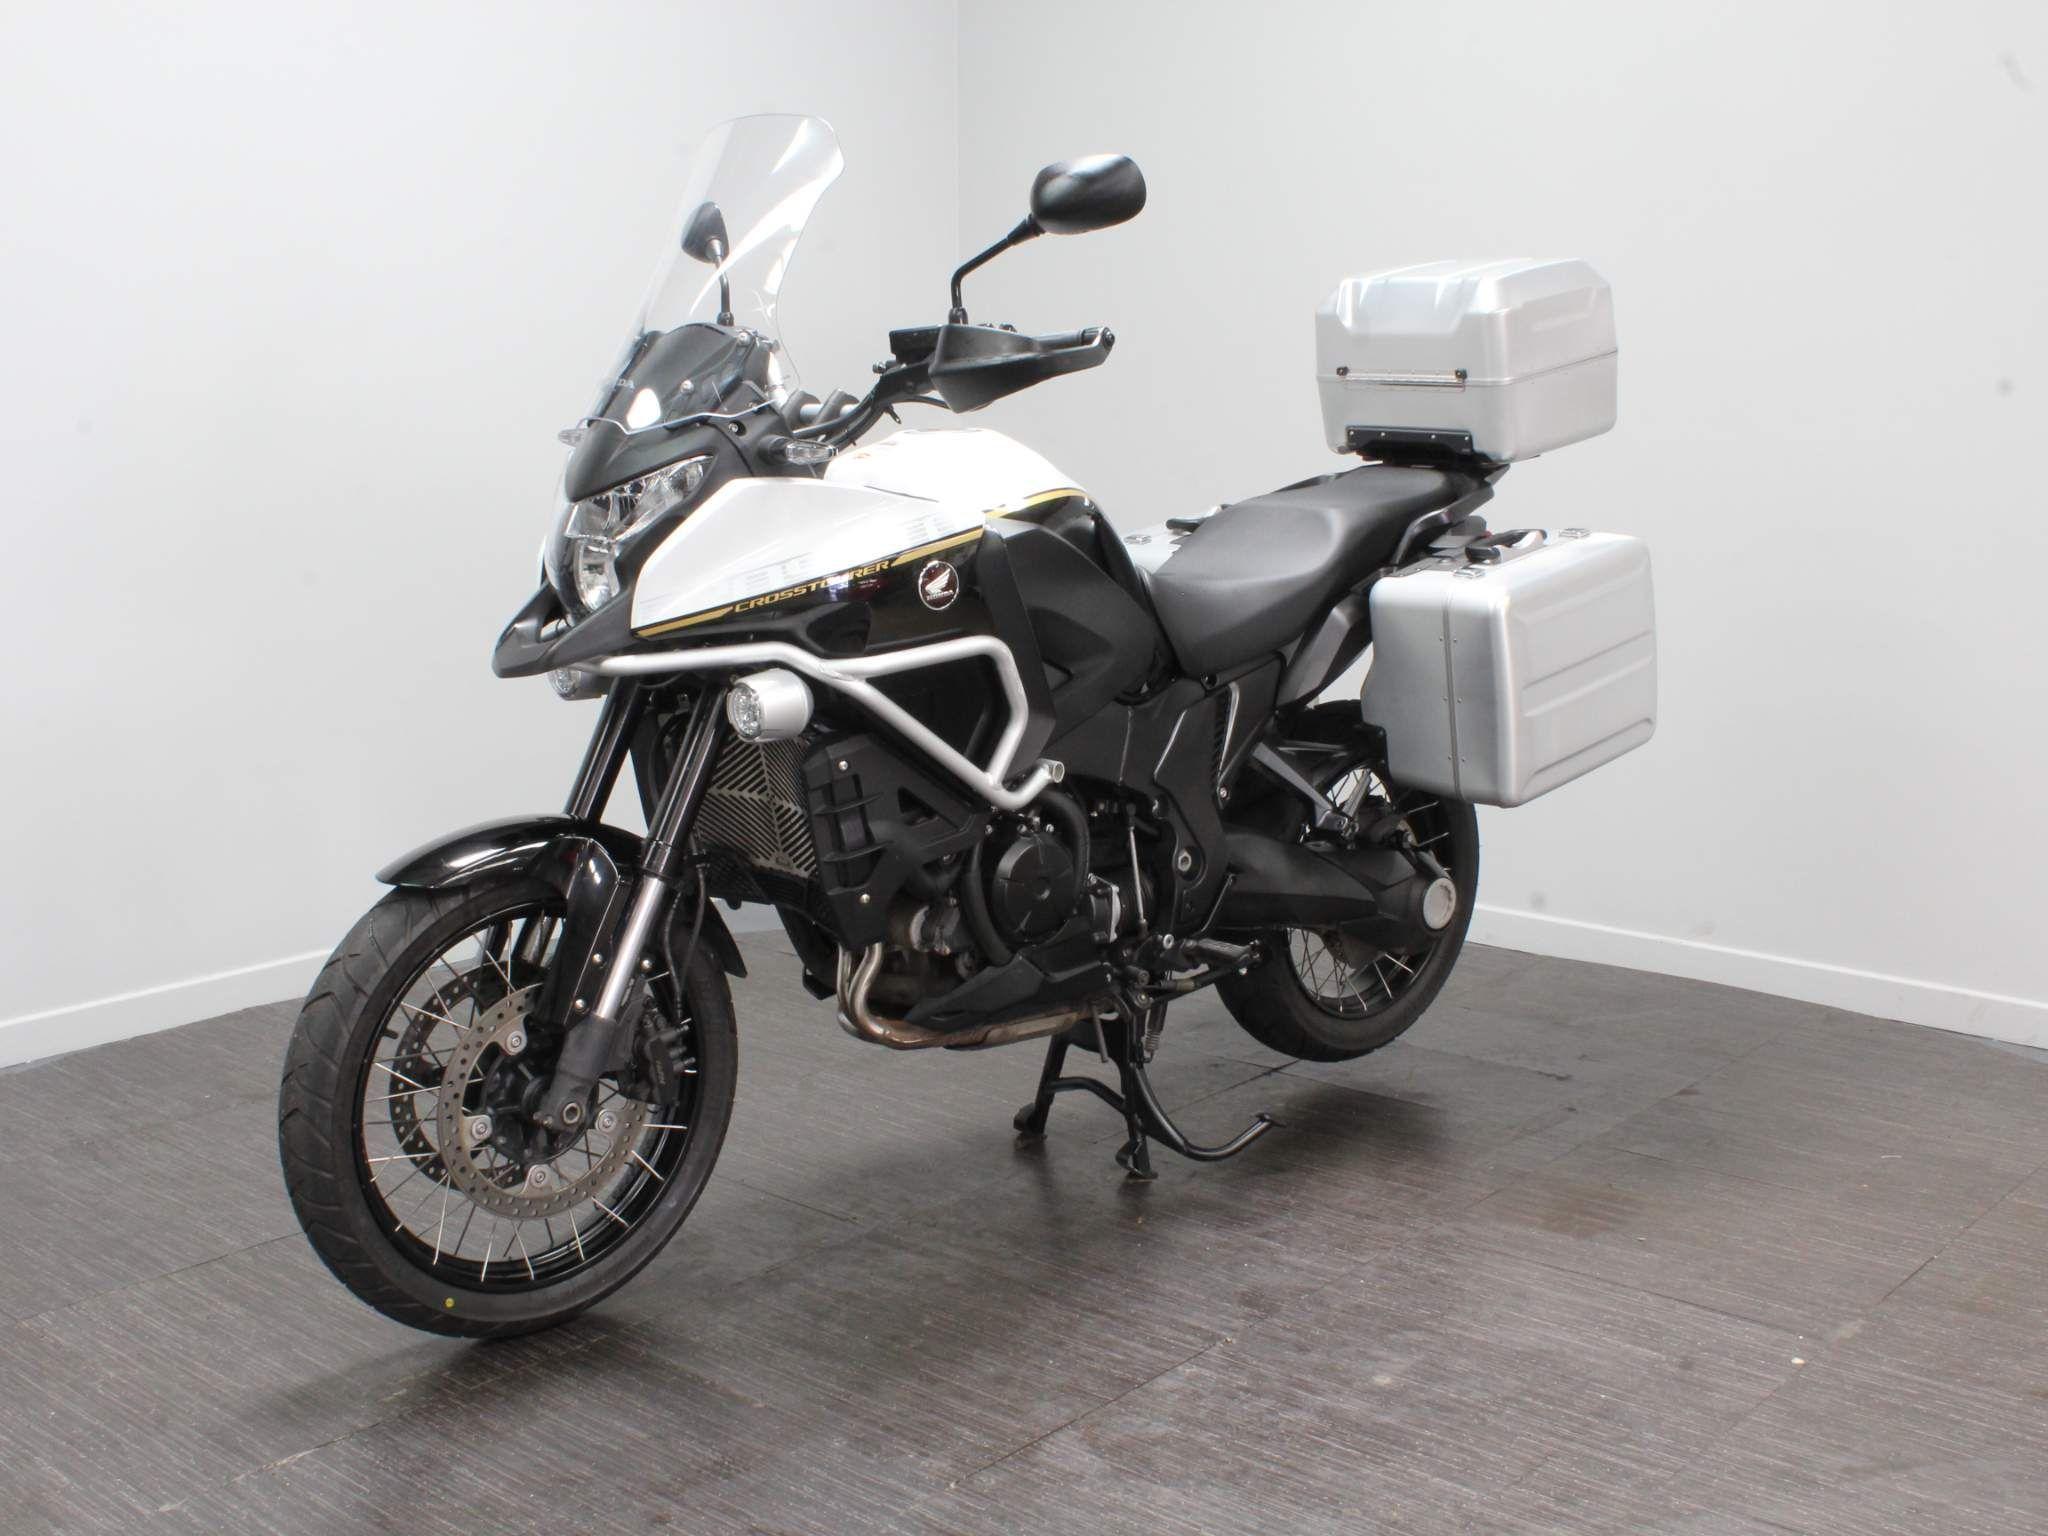 Honda VFR1200X Crosstourer Images